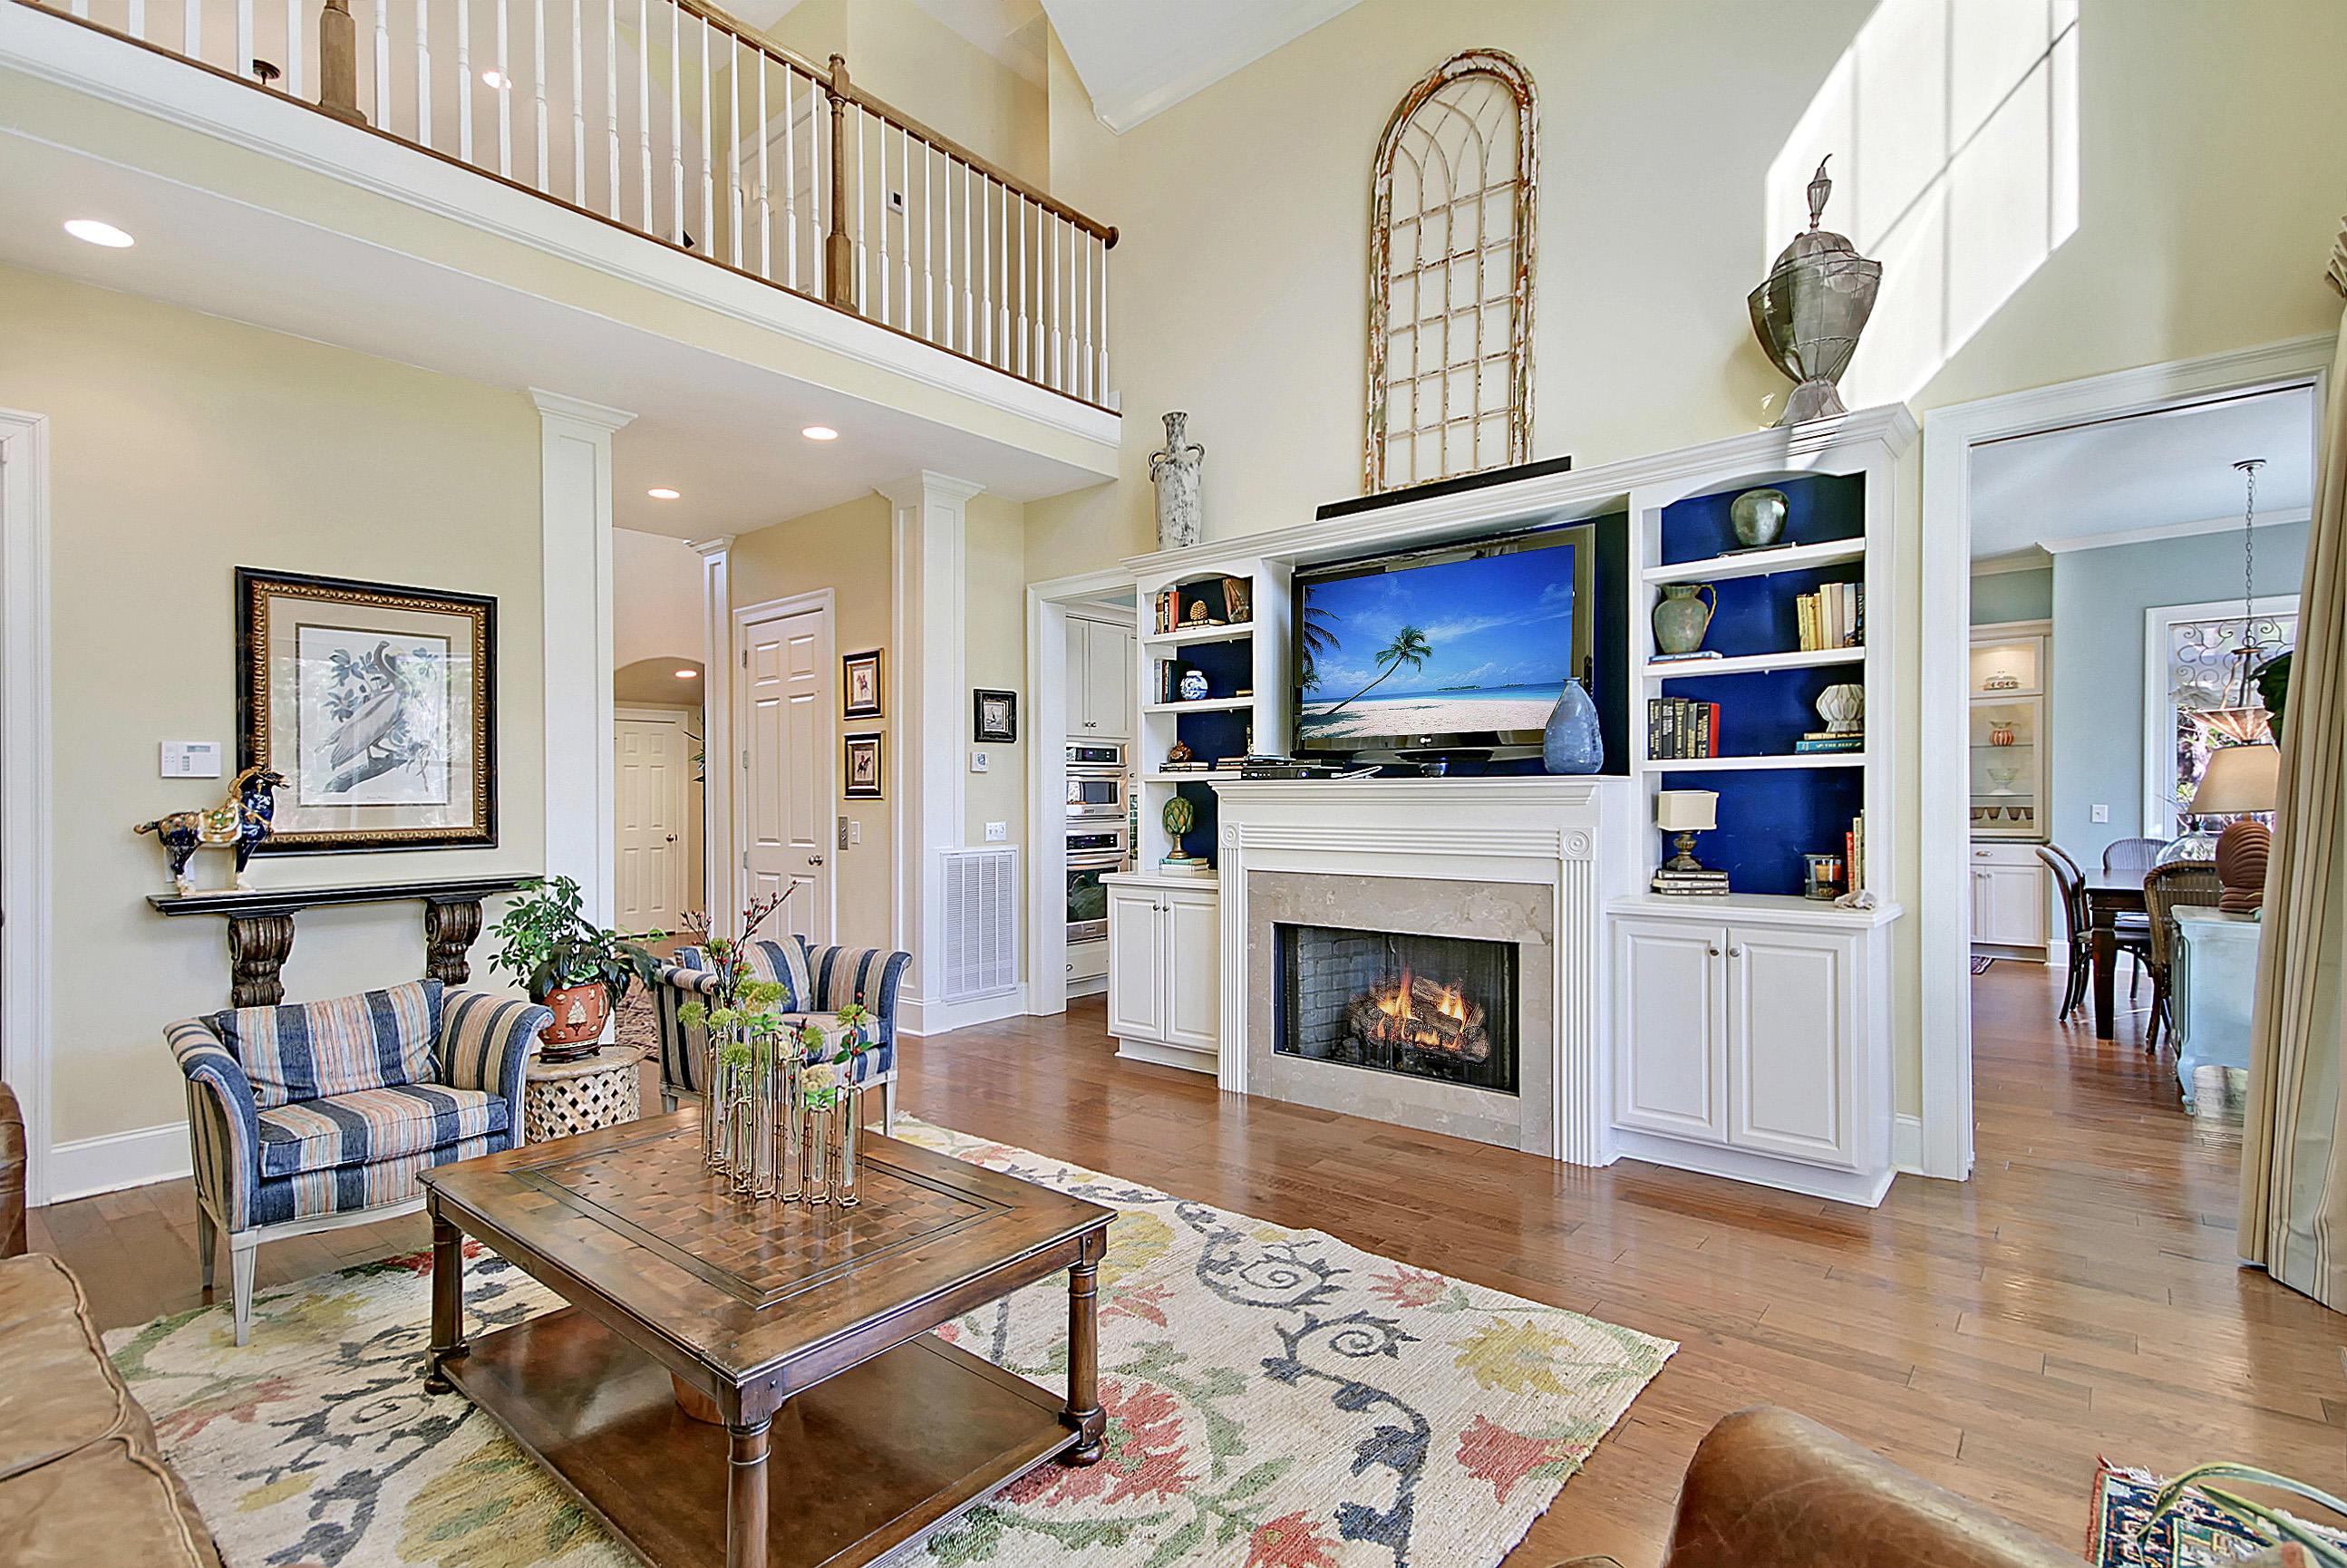 Rivertowne Country Club Homes For Sale - 2601 Kiln Creek, Mount Pleasant, SC - 9